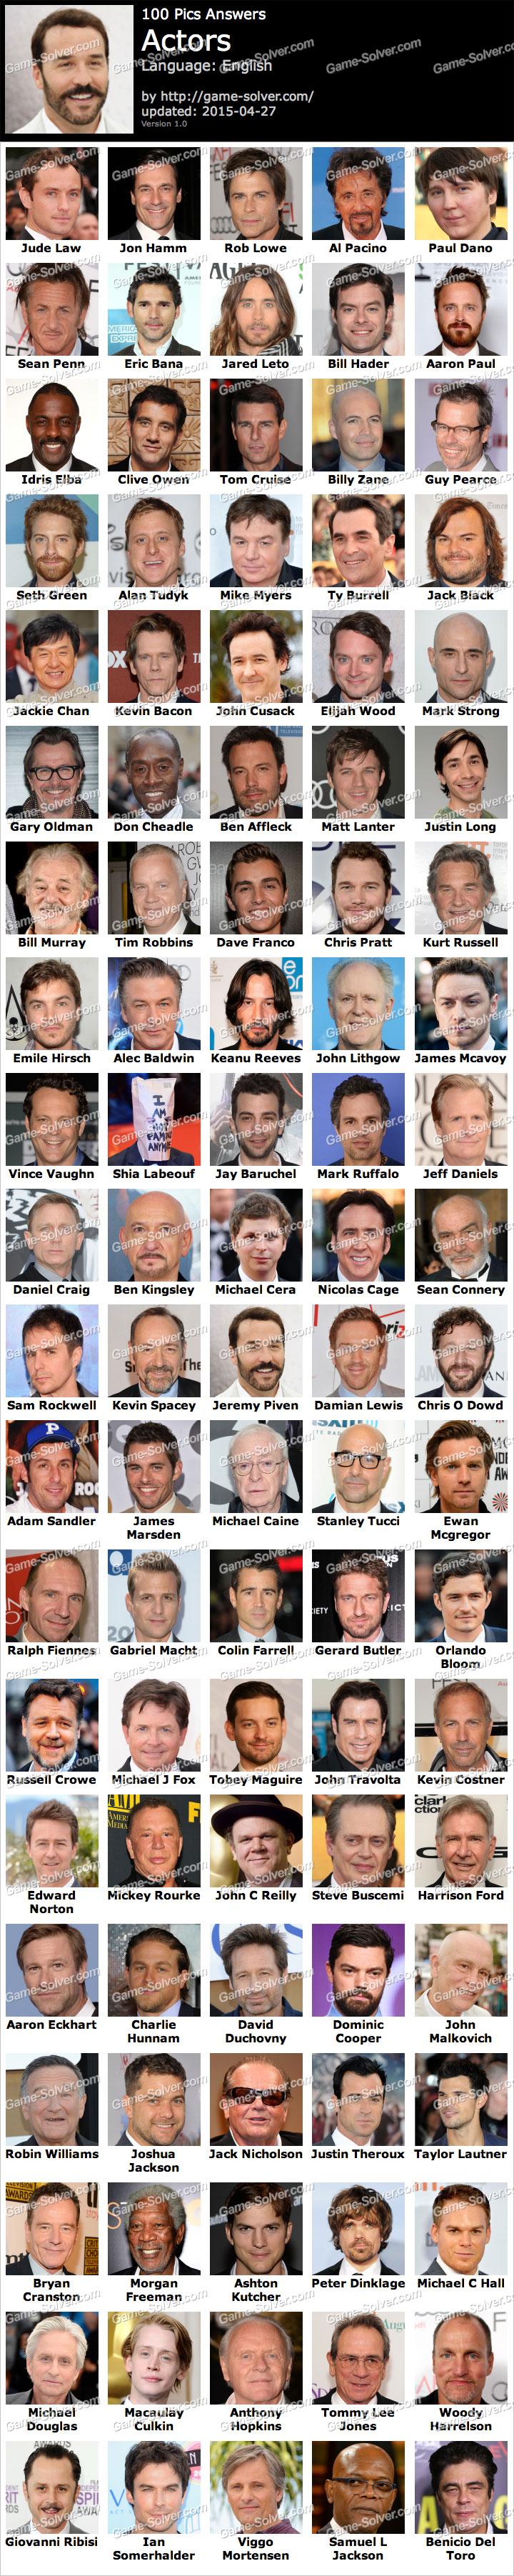 100 Pics Answers Movie Stars : answers, movie, stars, Actors, Solver